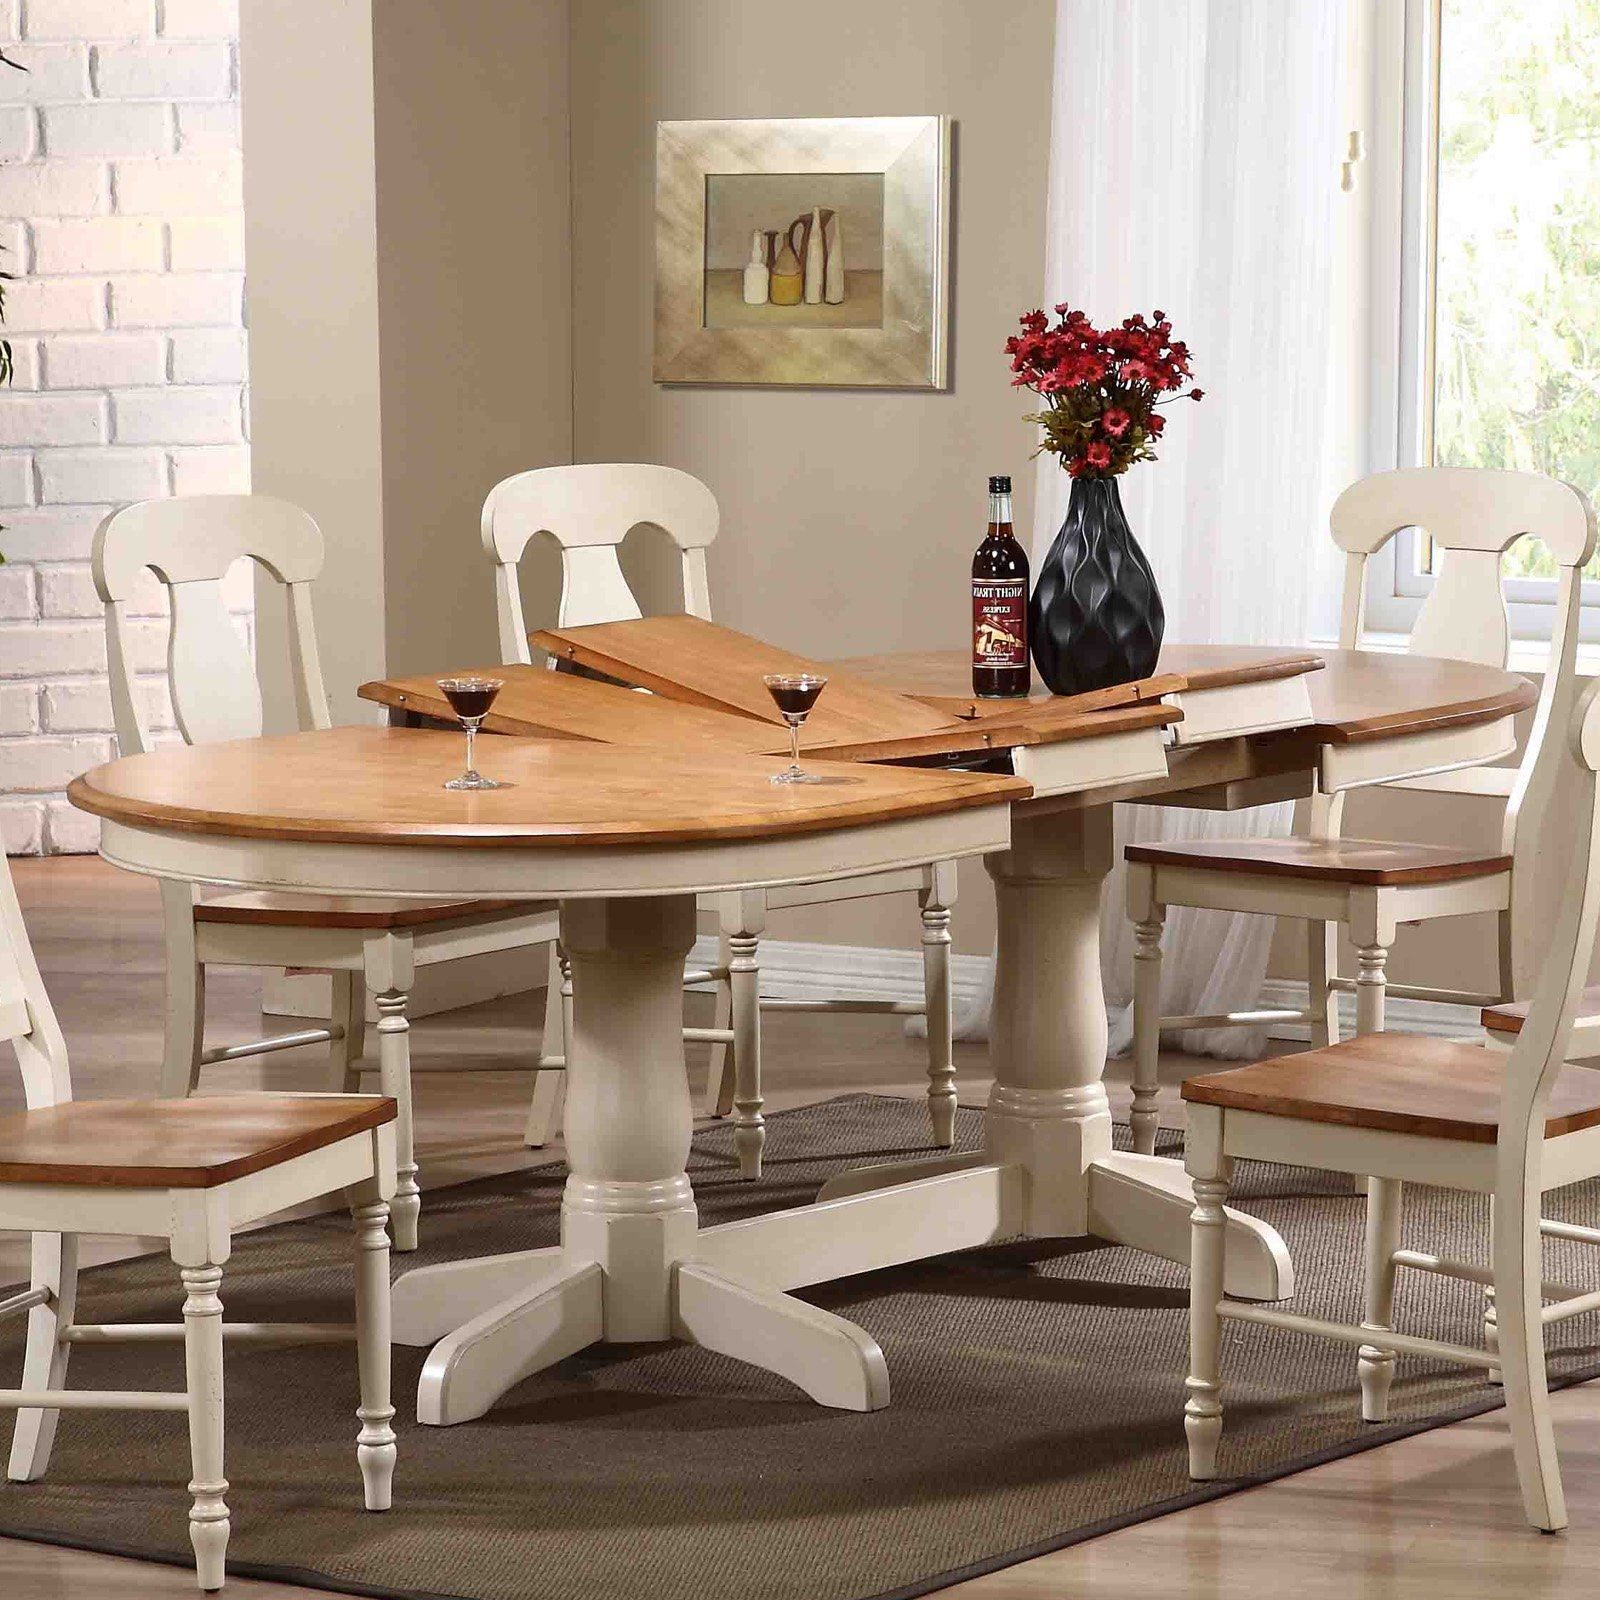 Round farmhouse kitchen table sets manageditservicesatlanta